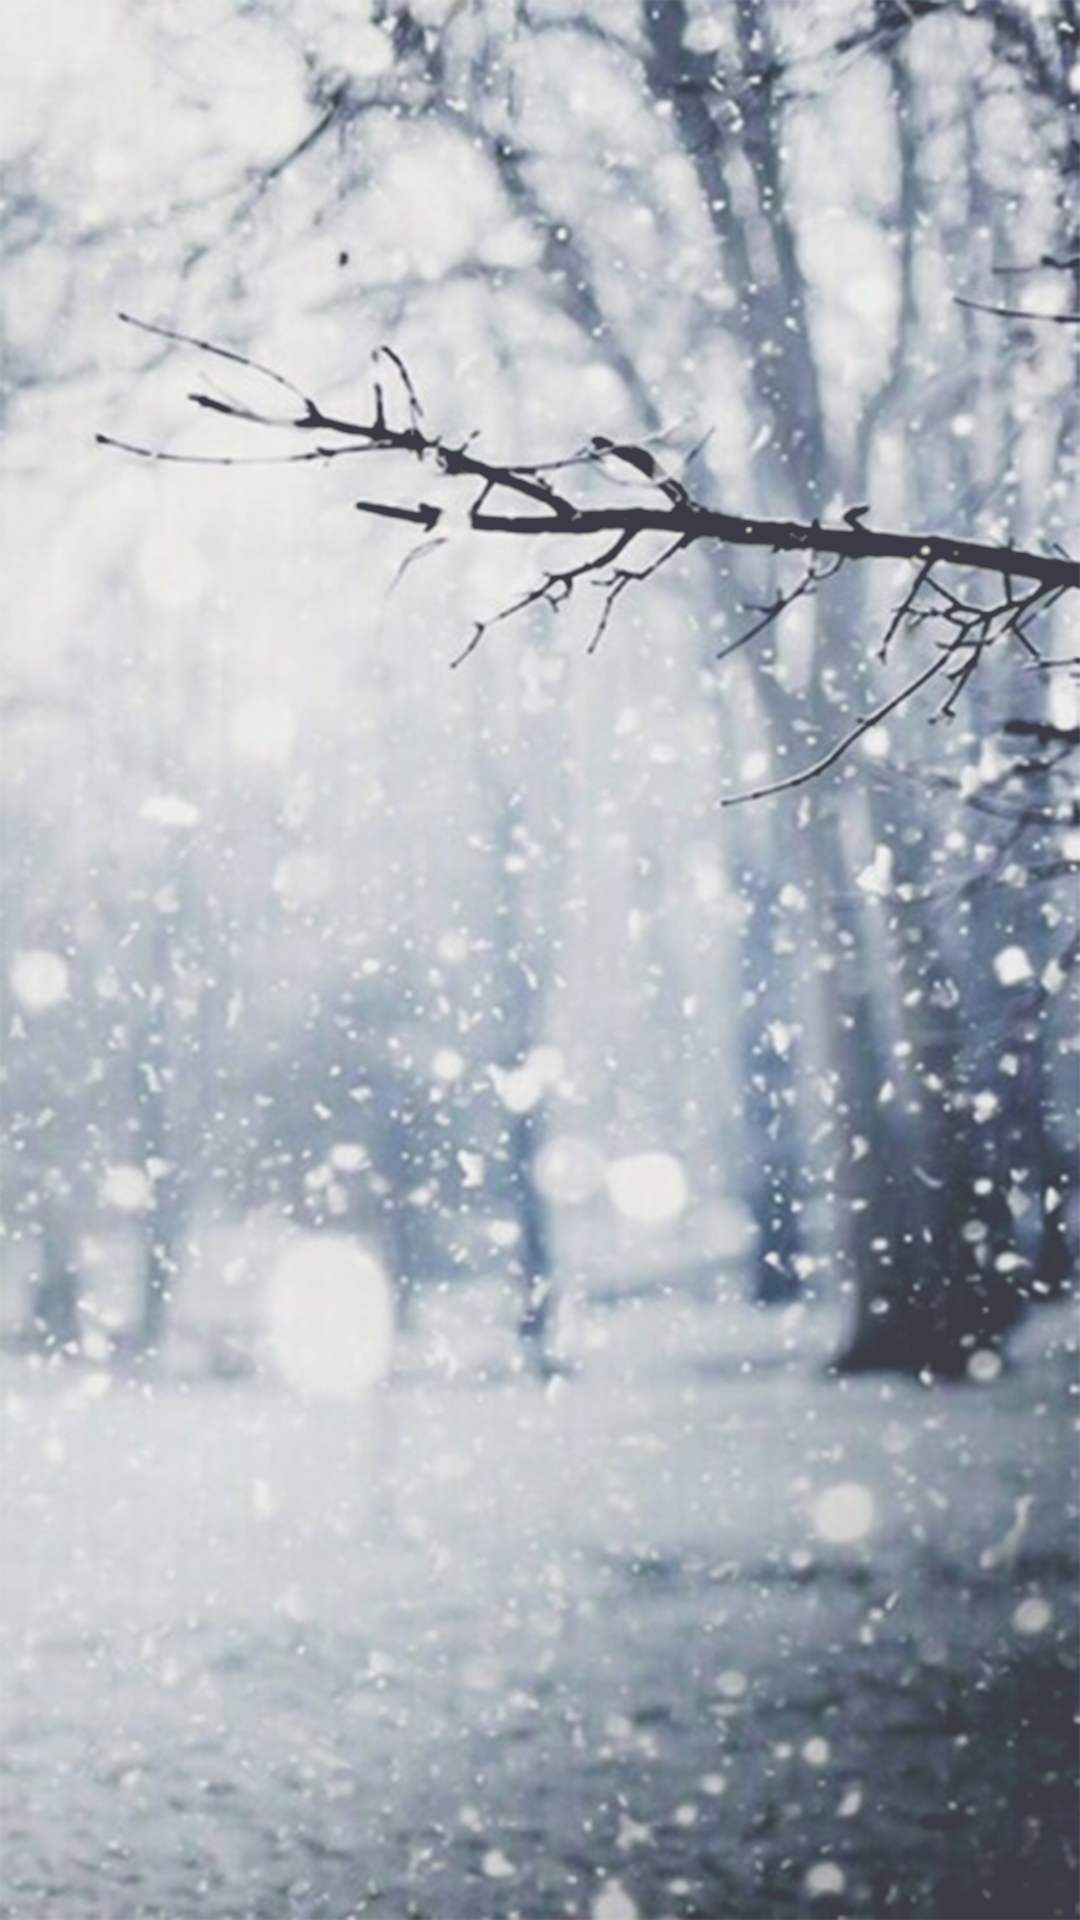 Falling Snow Wallpaper Iphone Christmas Wallpaper Tumblr Christmas Christmas